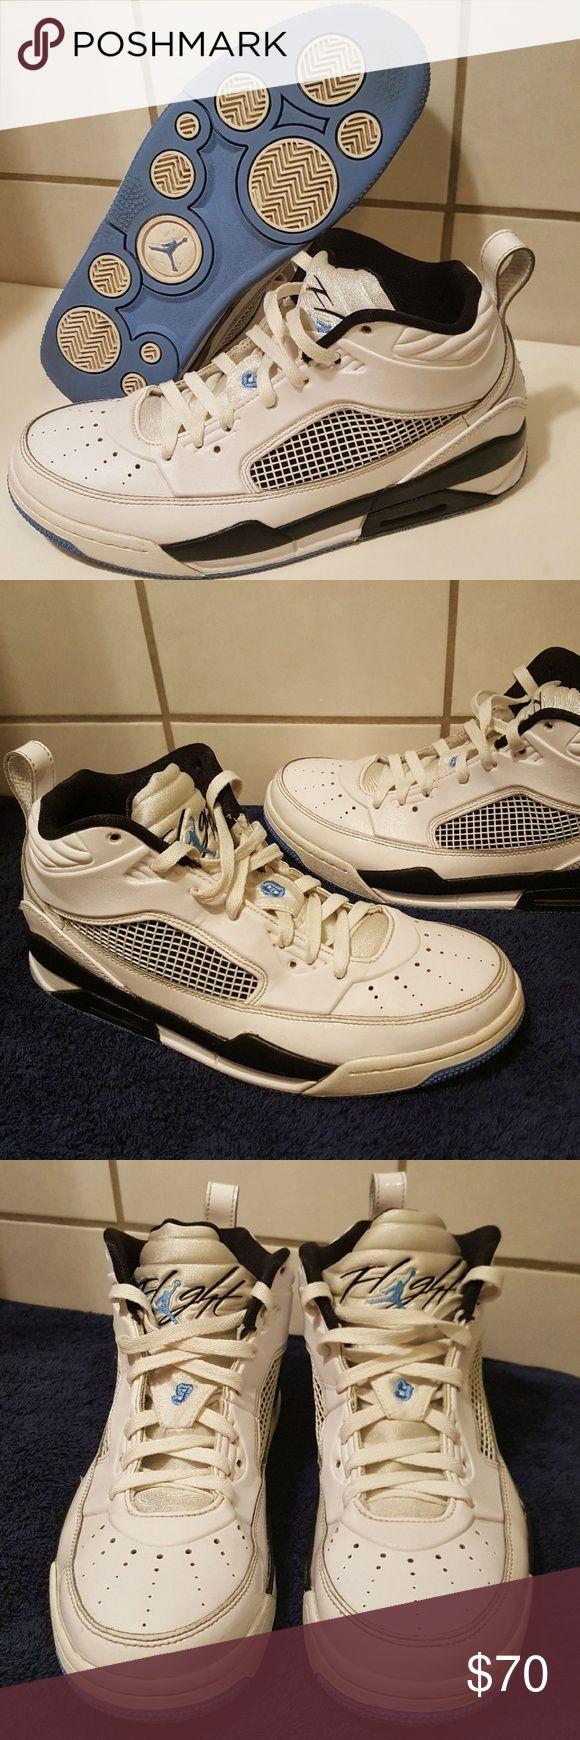 Jordan flight sneakers men's size (9) Clean and in very nice condition Jordan flight men's size (9).   FIRM PRICE ✔  Adidas, yeeze, Reebok, NiKE, JORDANS air, new balance, Puma, VANS, Under armour, saucony, Brooks, converse, Chuck Taylors Jordan Shoes Sneakers